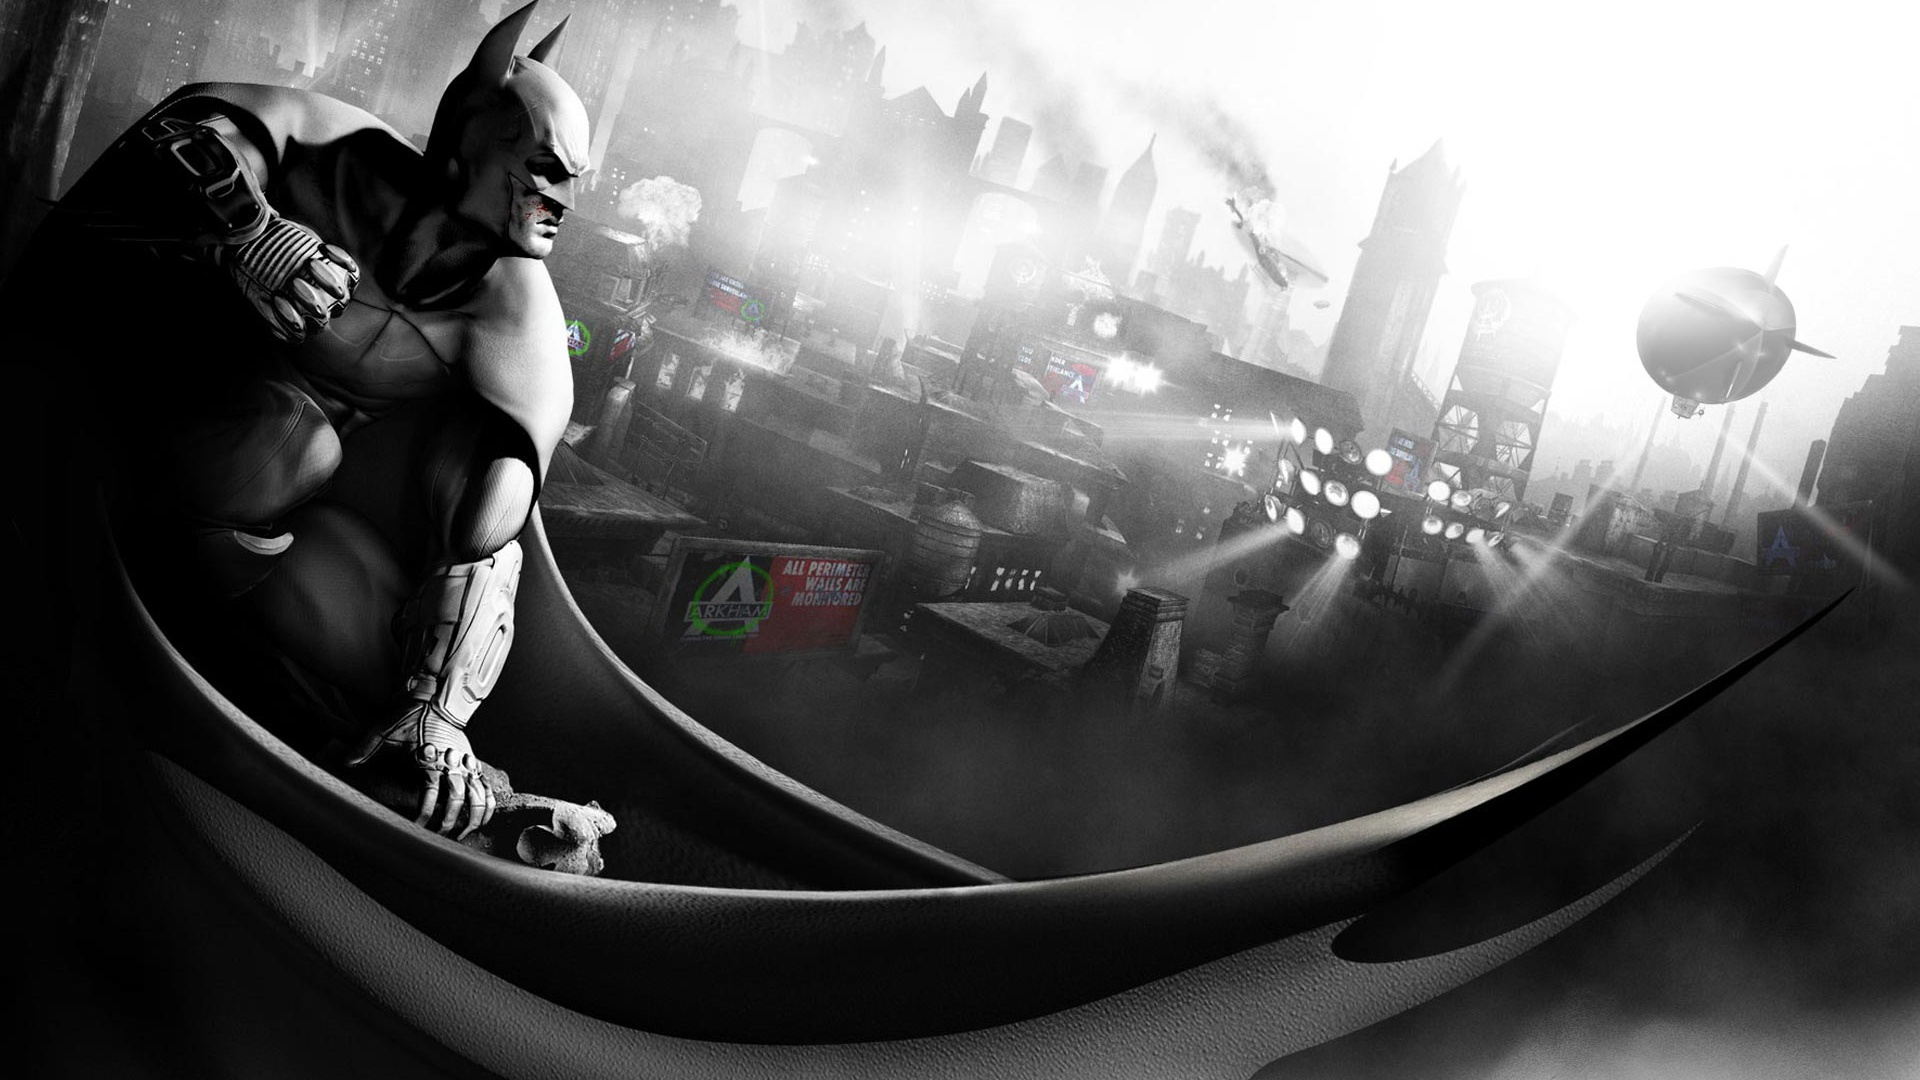 2011 Batman Arkham City Wallpapers HD Wallpapers 1920x1080